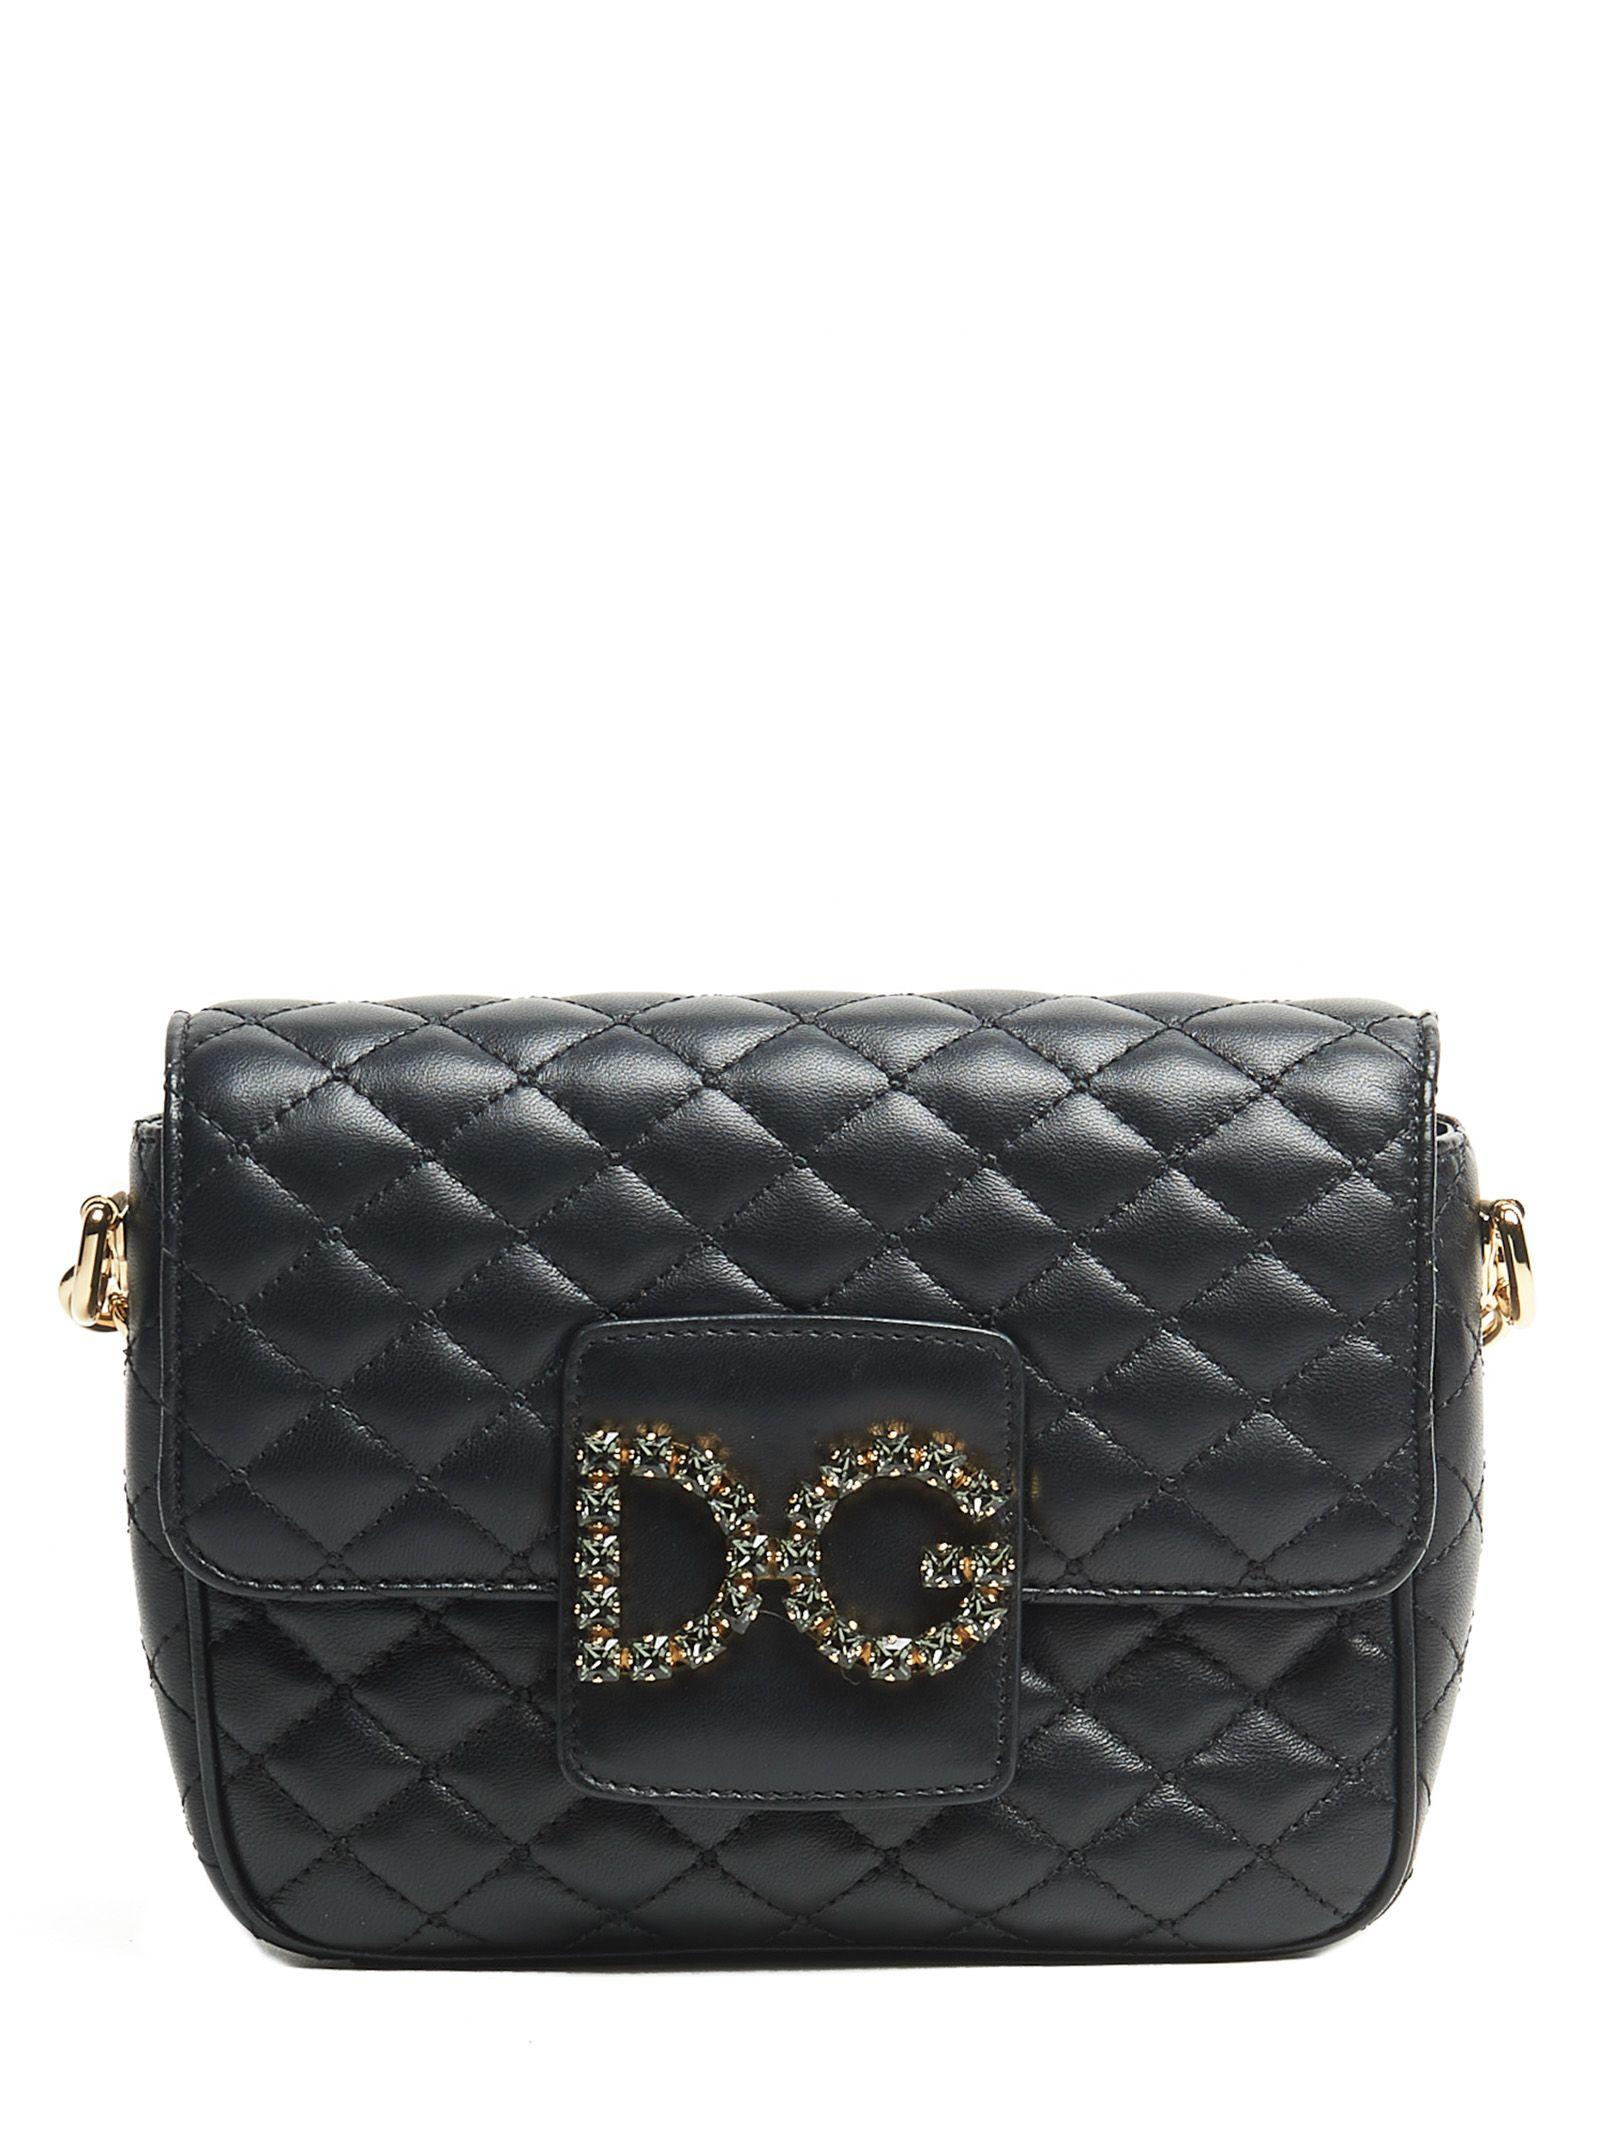 0143769697 Dolce   Gabbana Dolce   Gabbana  dg Millennials  Bag - Black ...